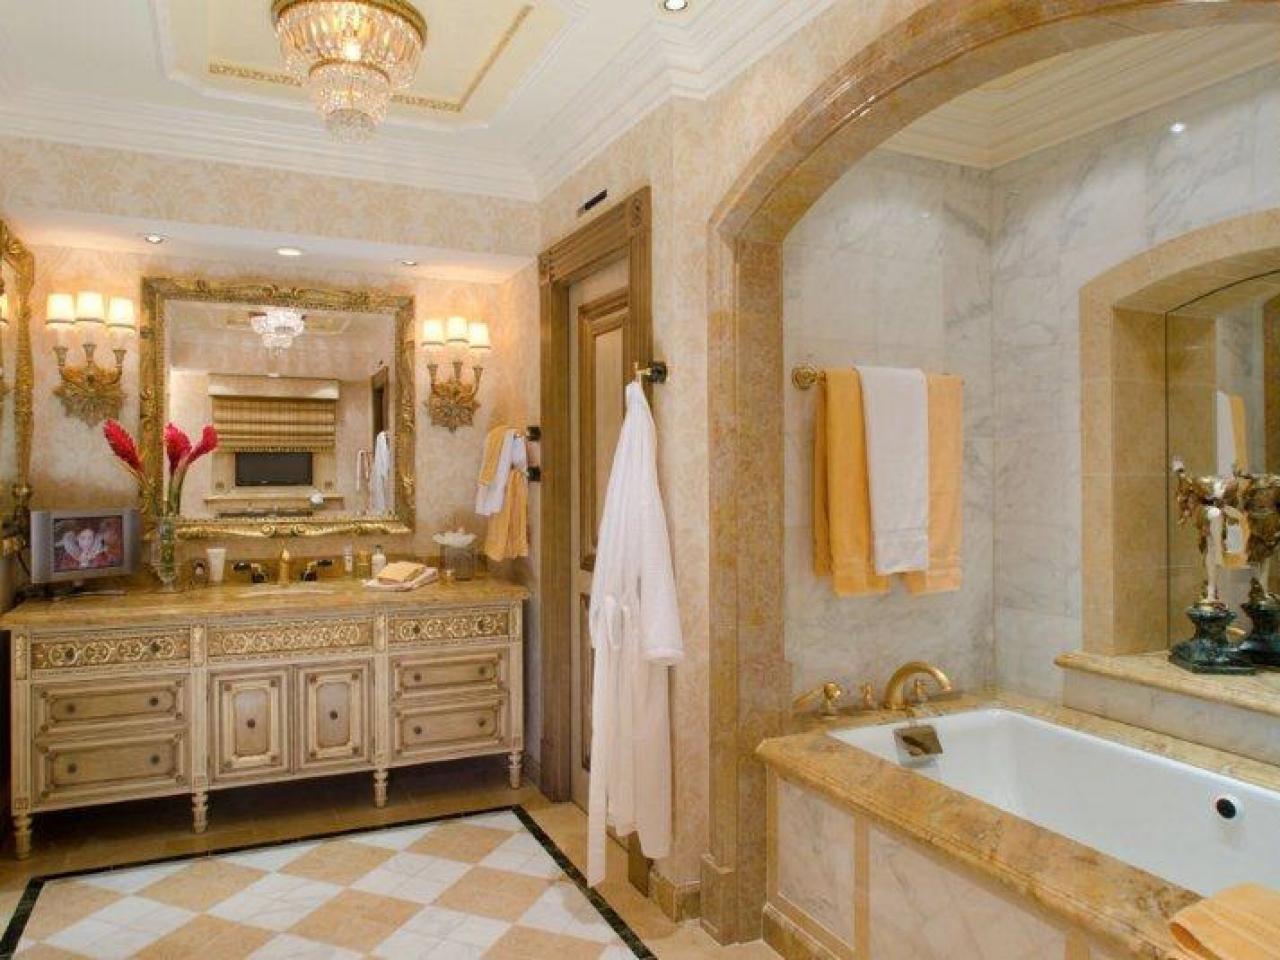 Bathroom in Classic Style | Interior design ideas and photos